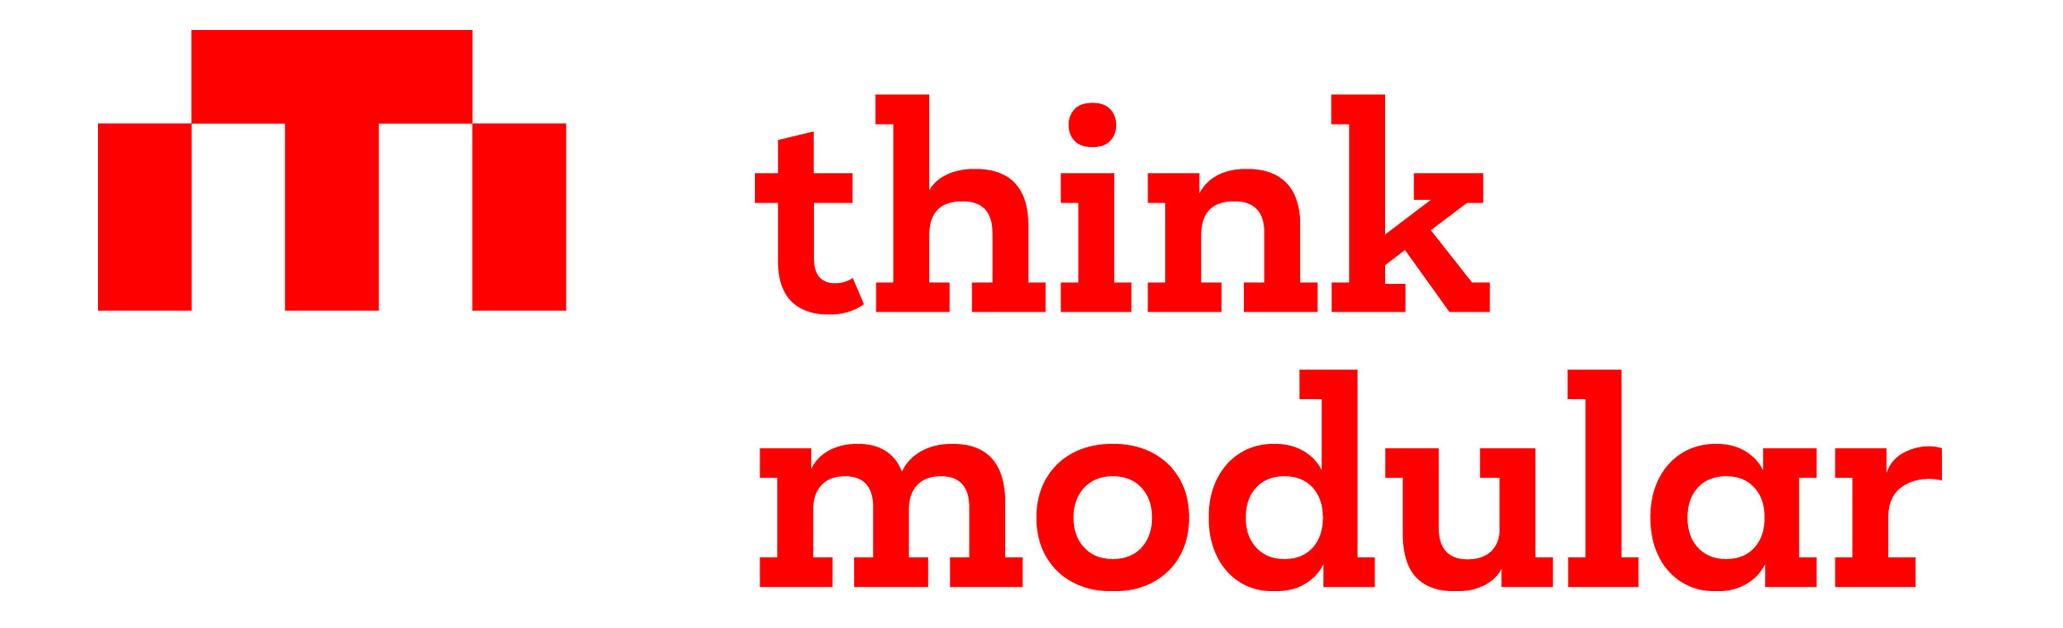 think modular - digital Solutions GmbH